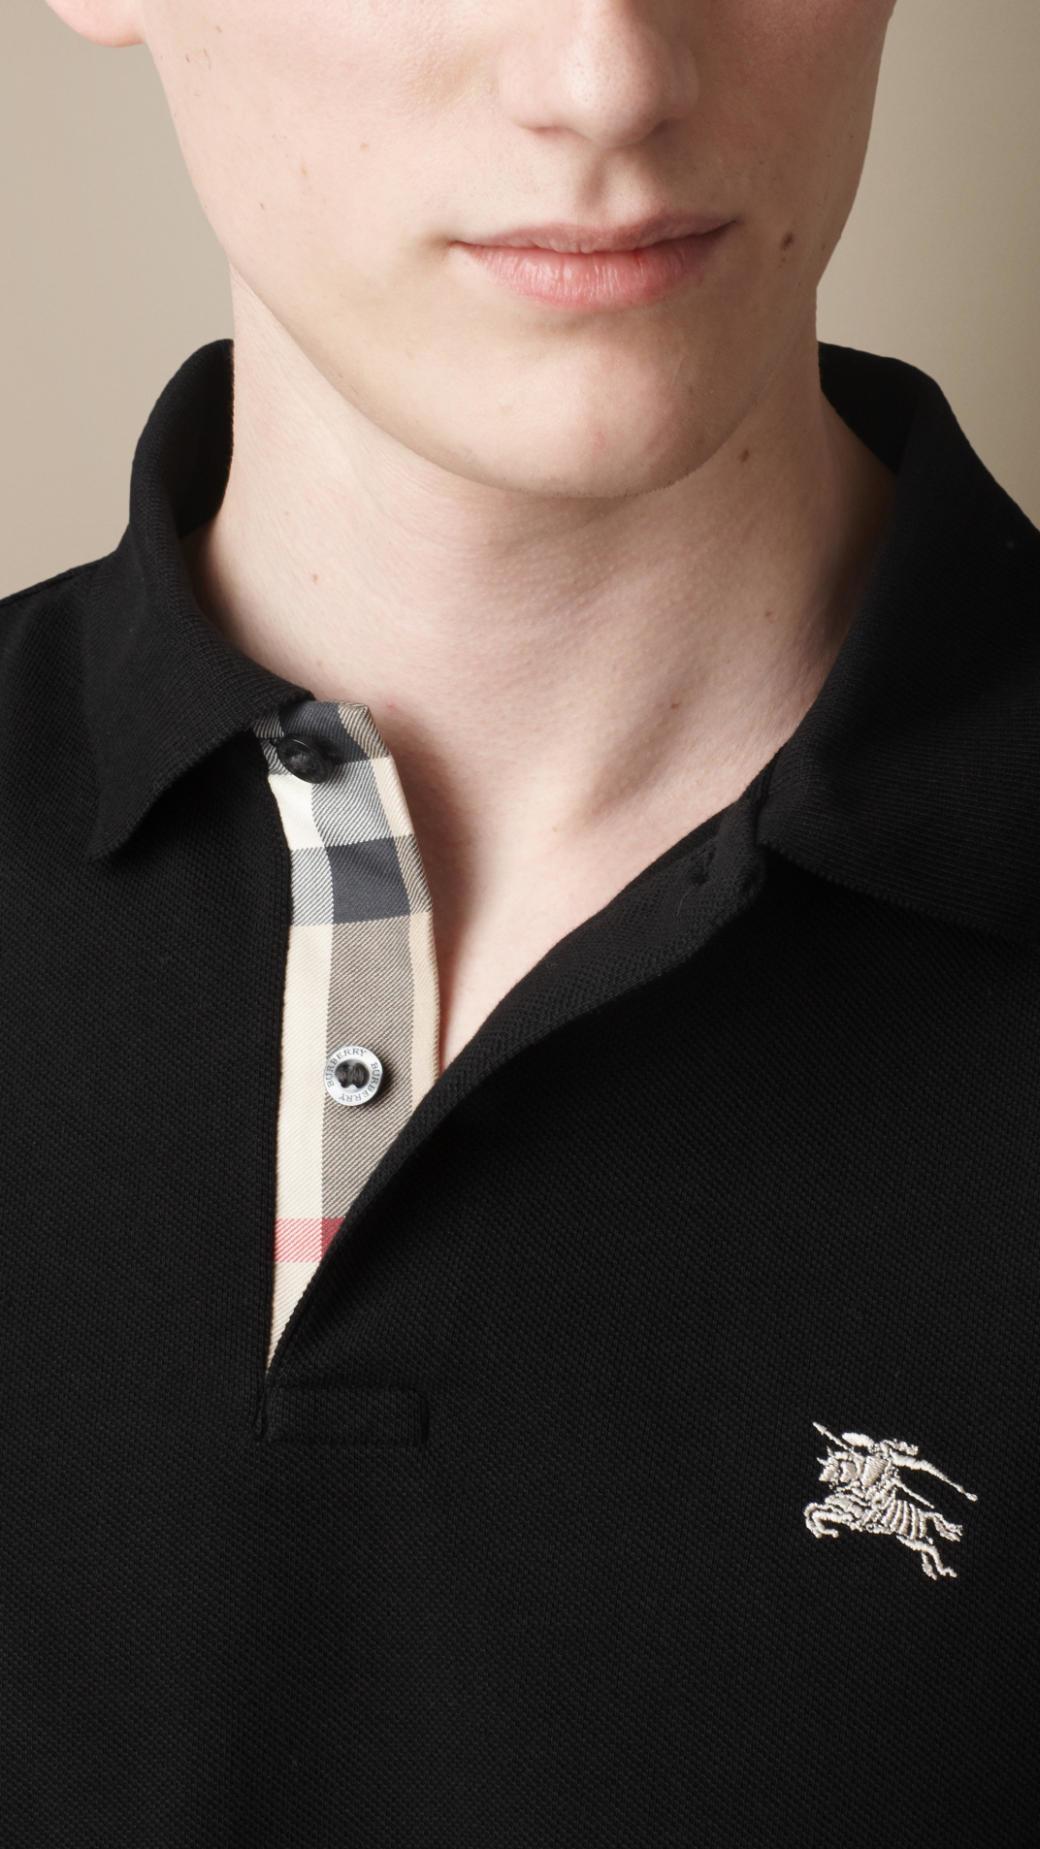 e2aa1b99da1da Lyst - Burberry Long Sleeve Polo Shirt in Black for Men